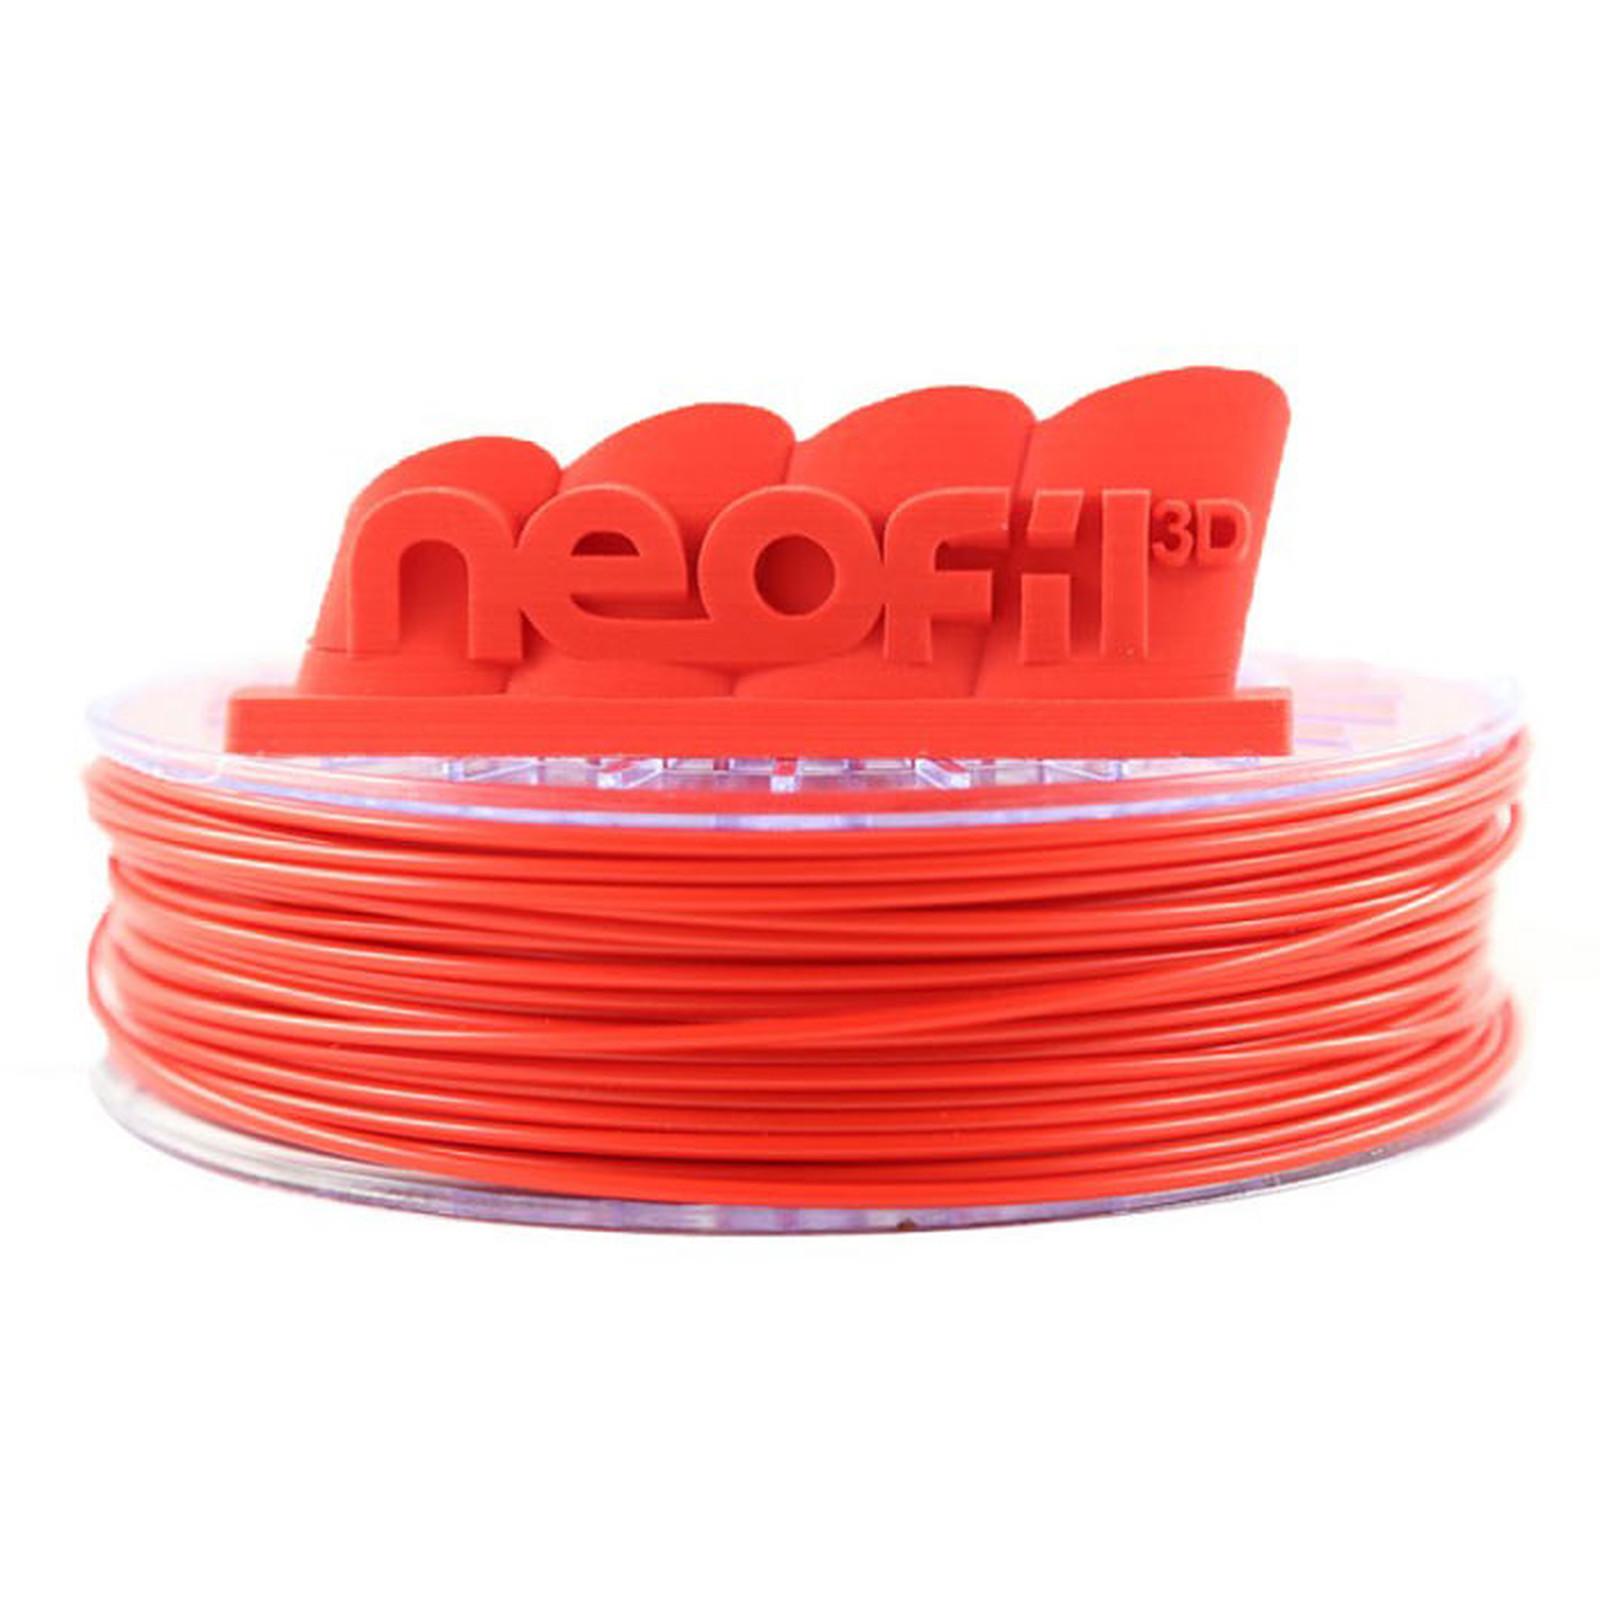 Neofil3D Bobine M-ABS 1.75mm 750g - Rouge